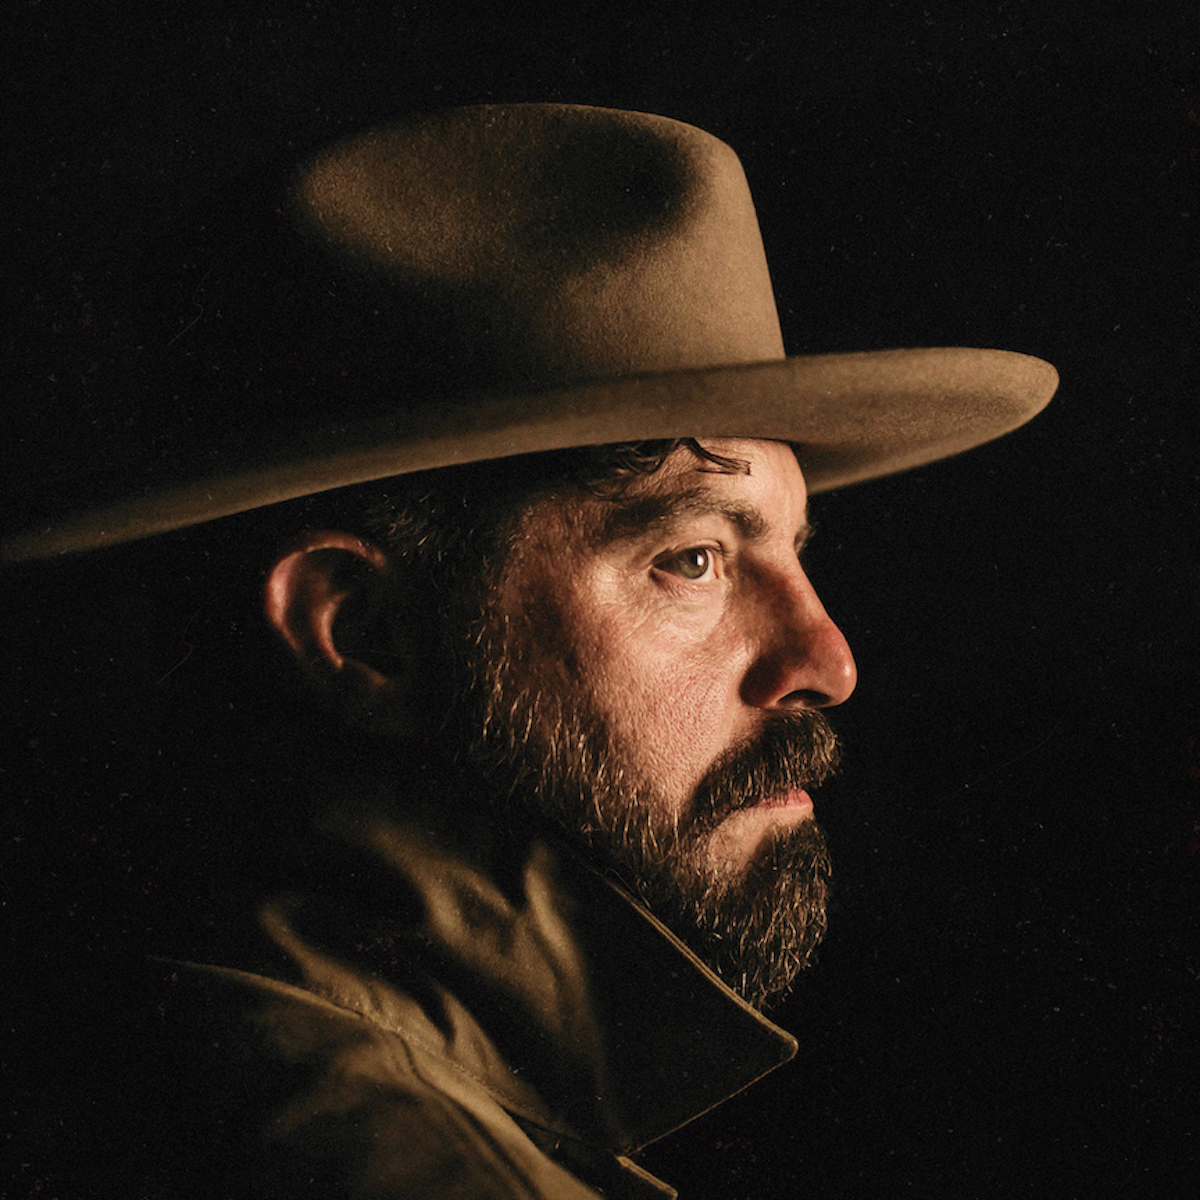 Bethel Music's Josh Baldwin releases new album, says praying for resurrection grew his faith